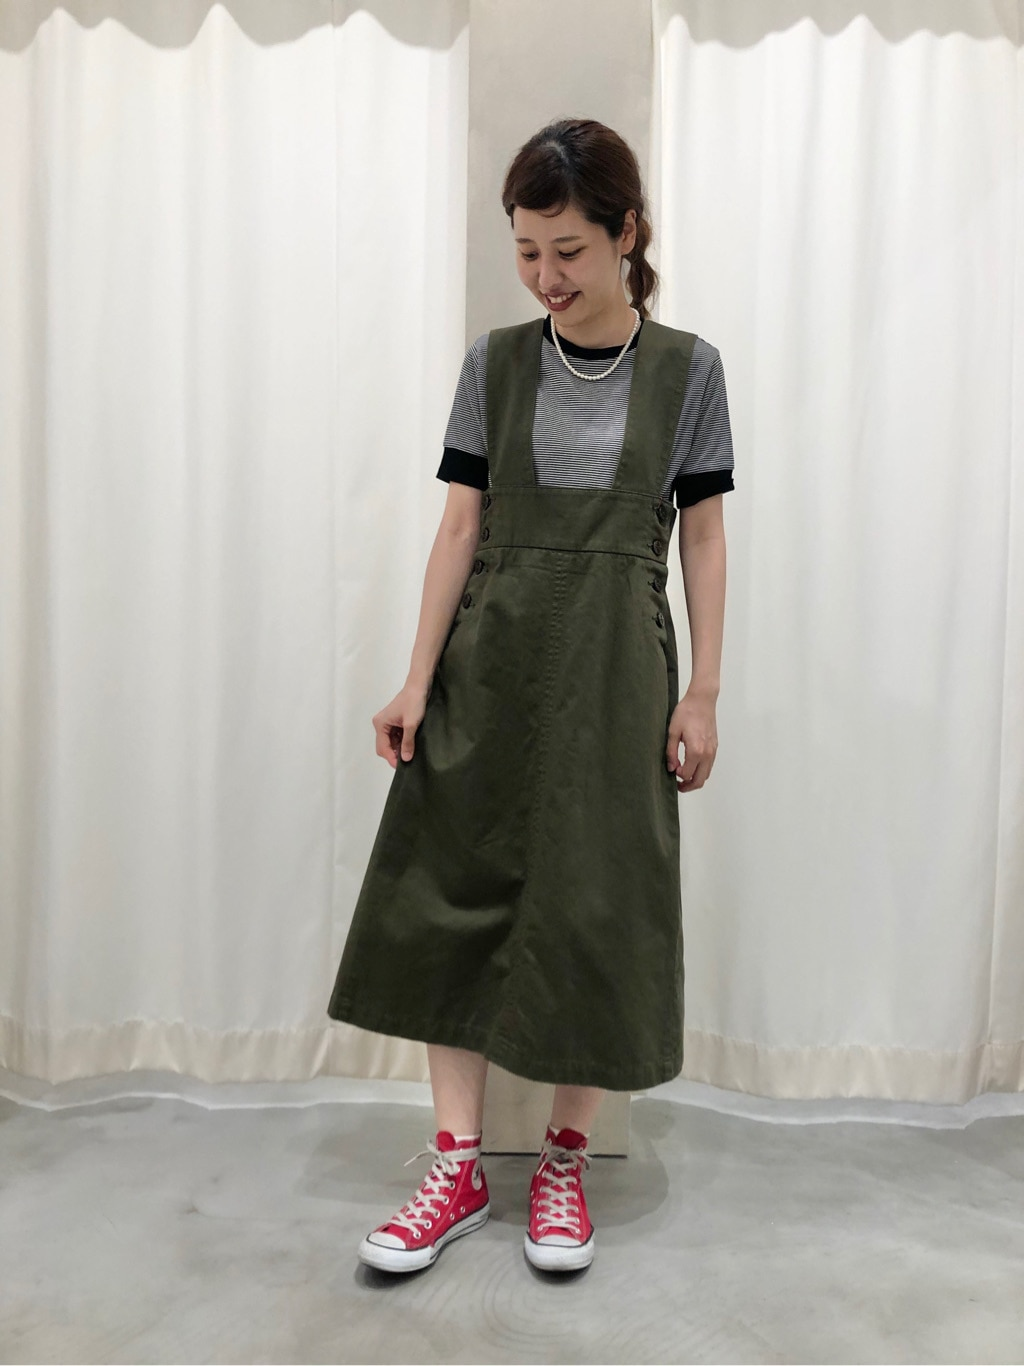 AMB SHOP CHILD WOMAN CHILD WOMAN , PAR ICI 東京スカイツリータウン・ソラマチ 身長:160cm 2020.07.29